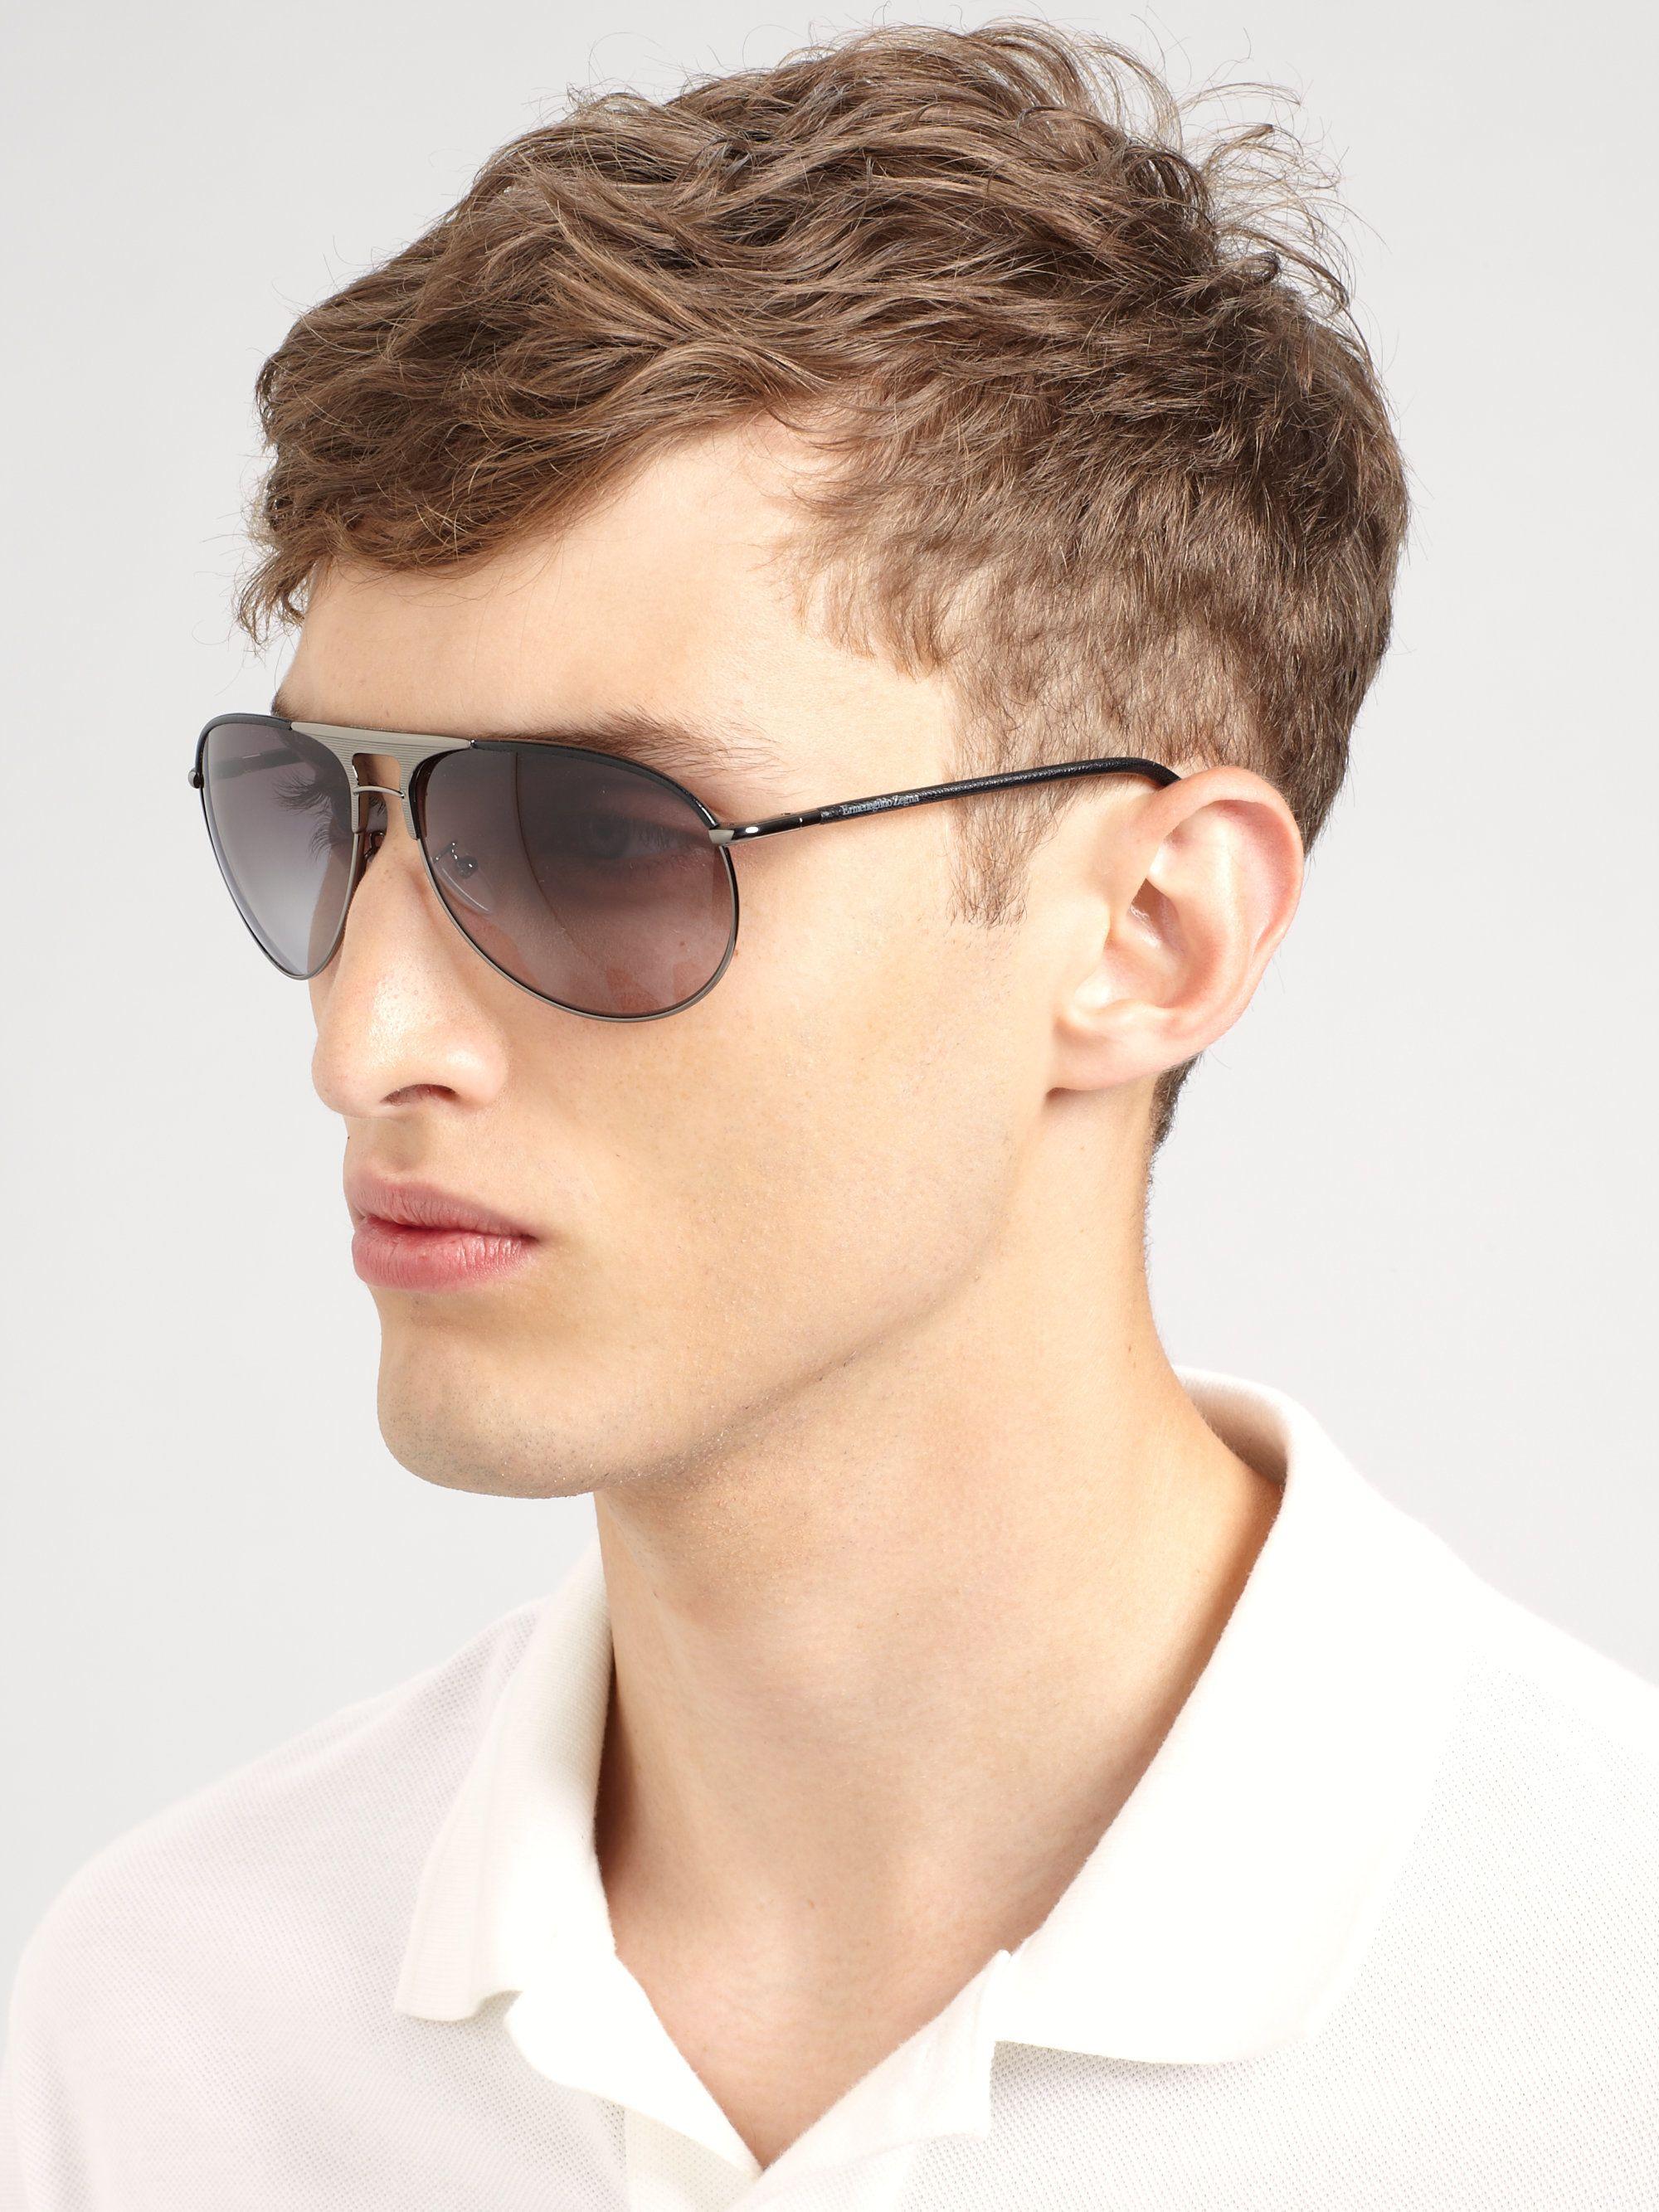 f2b4a28f Ermenegildo zegna Aviator Sunglasses | E R M E N G I L D O ...